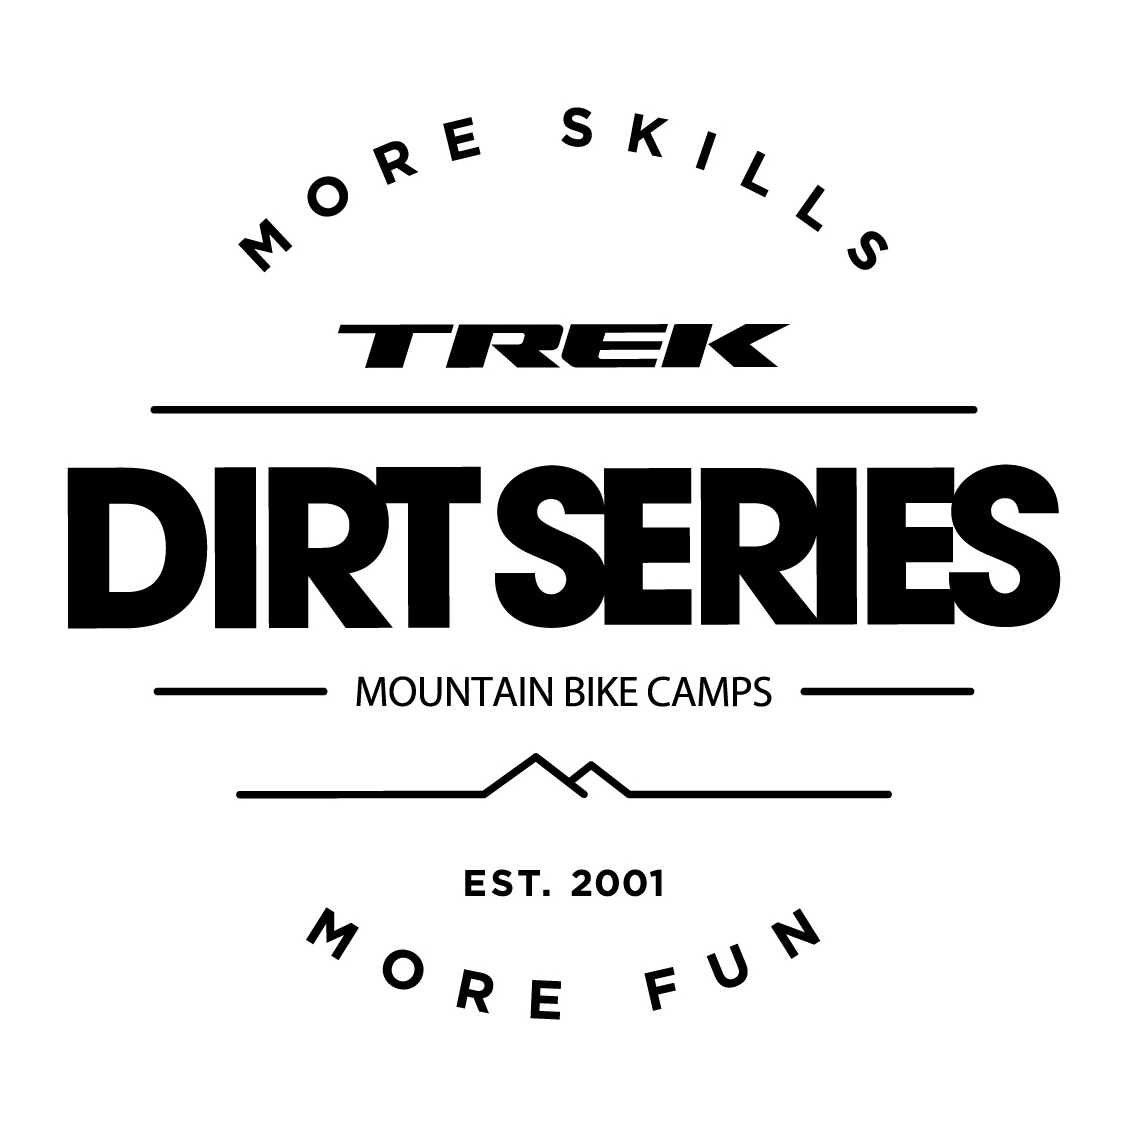 Dirt Series Mountain Bike Camp (co-ed) - Whistler, BC